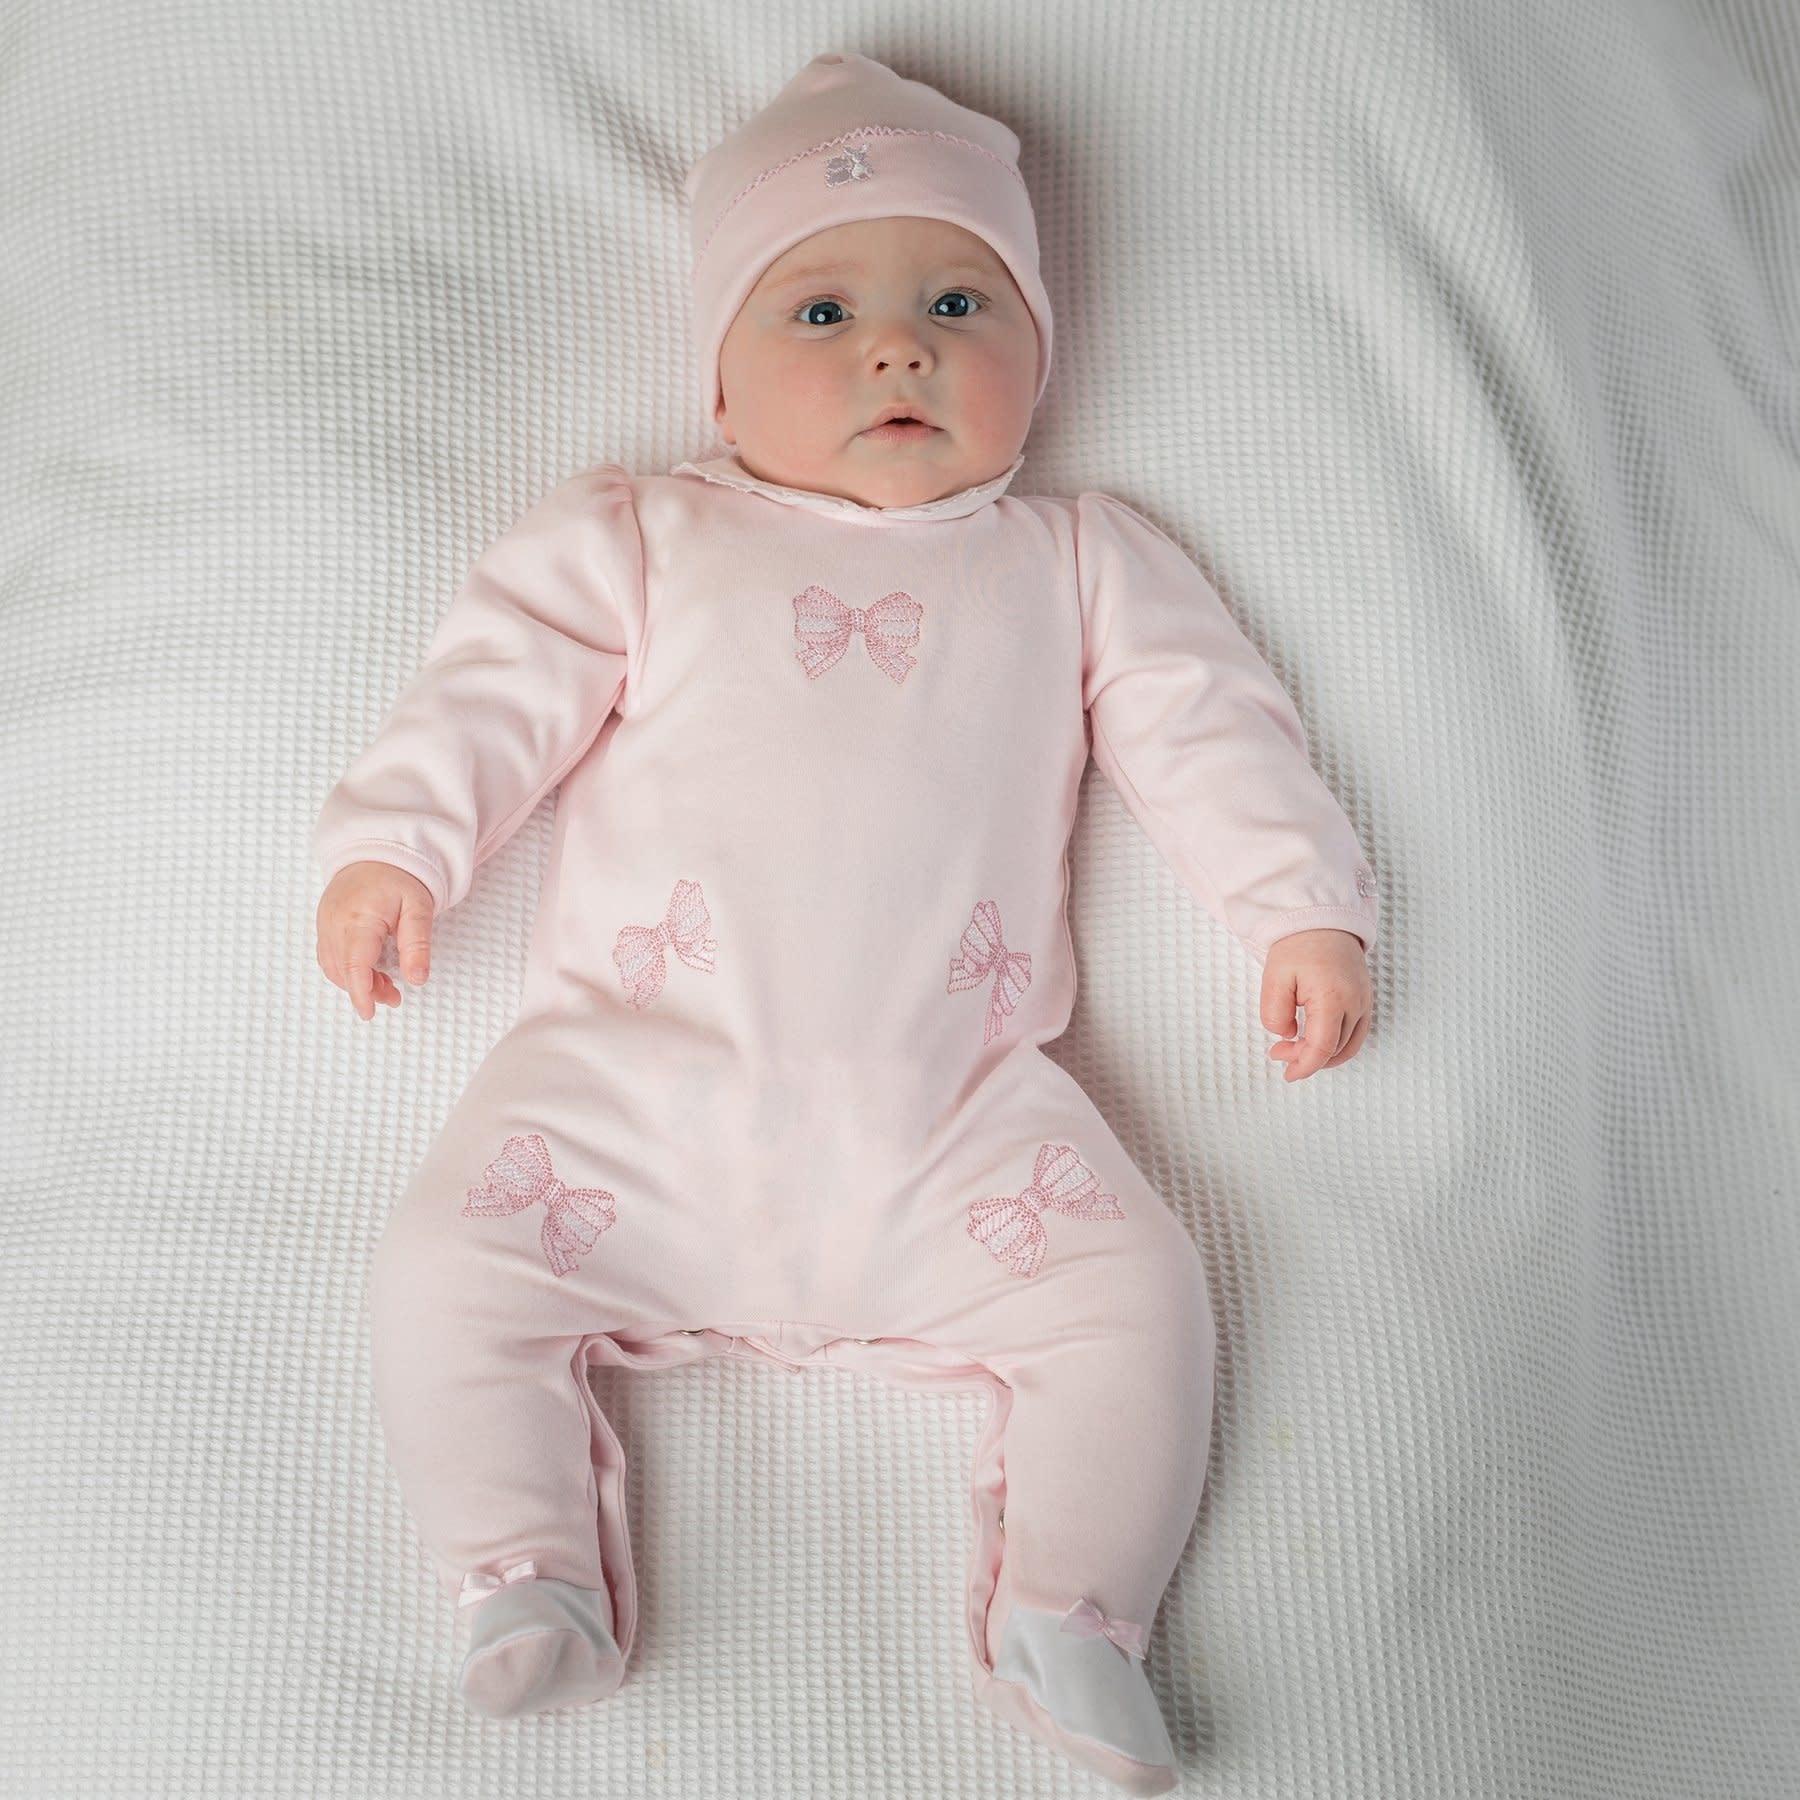 Emile et Rose Emile et Rose Winter Baby Girls Babygrow & Hat S21